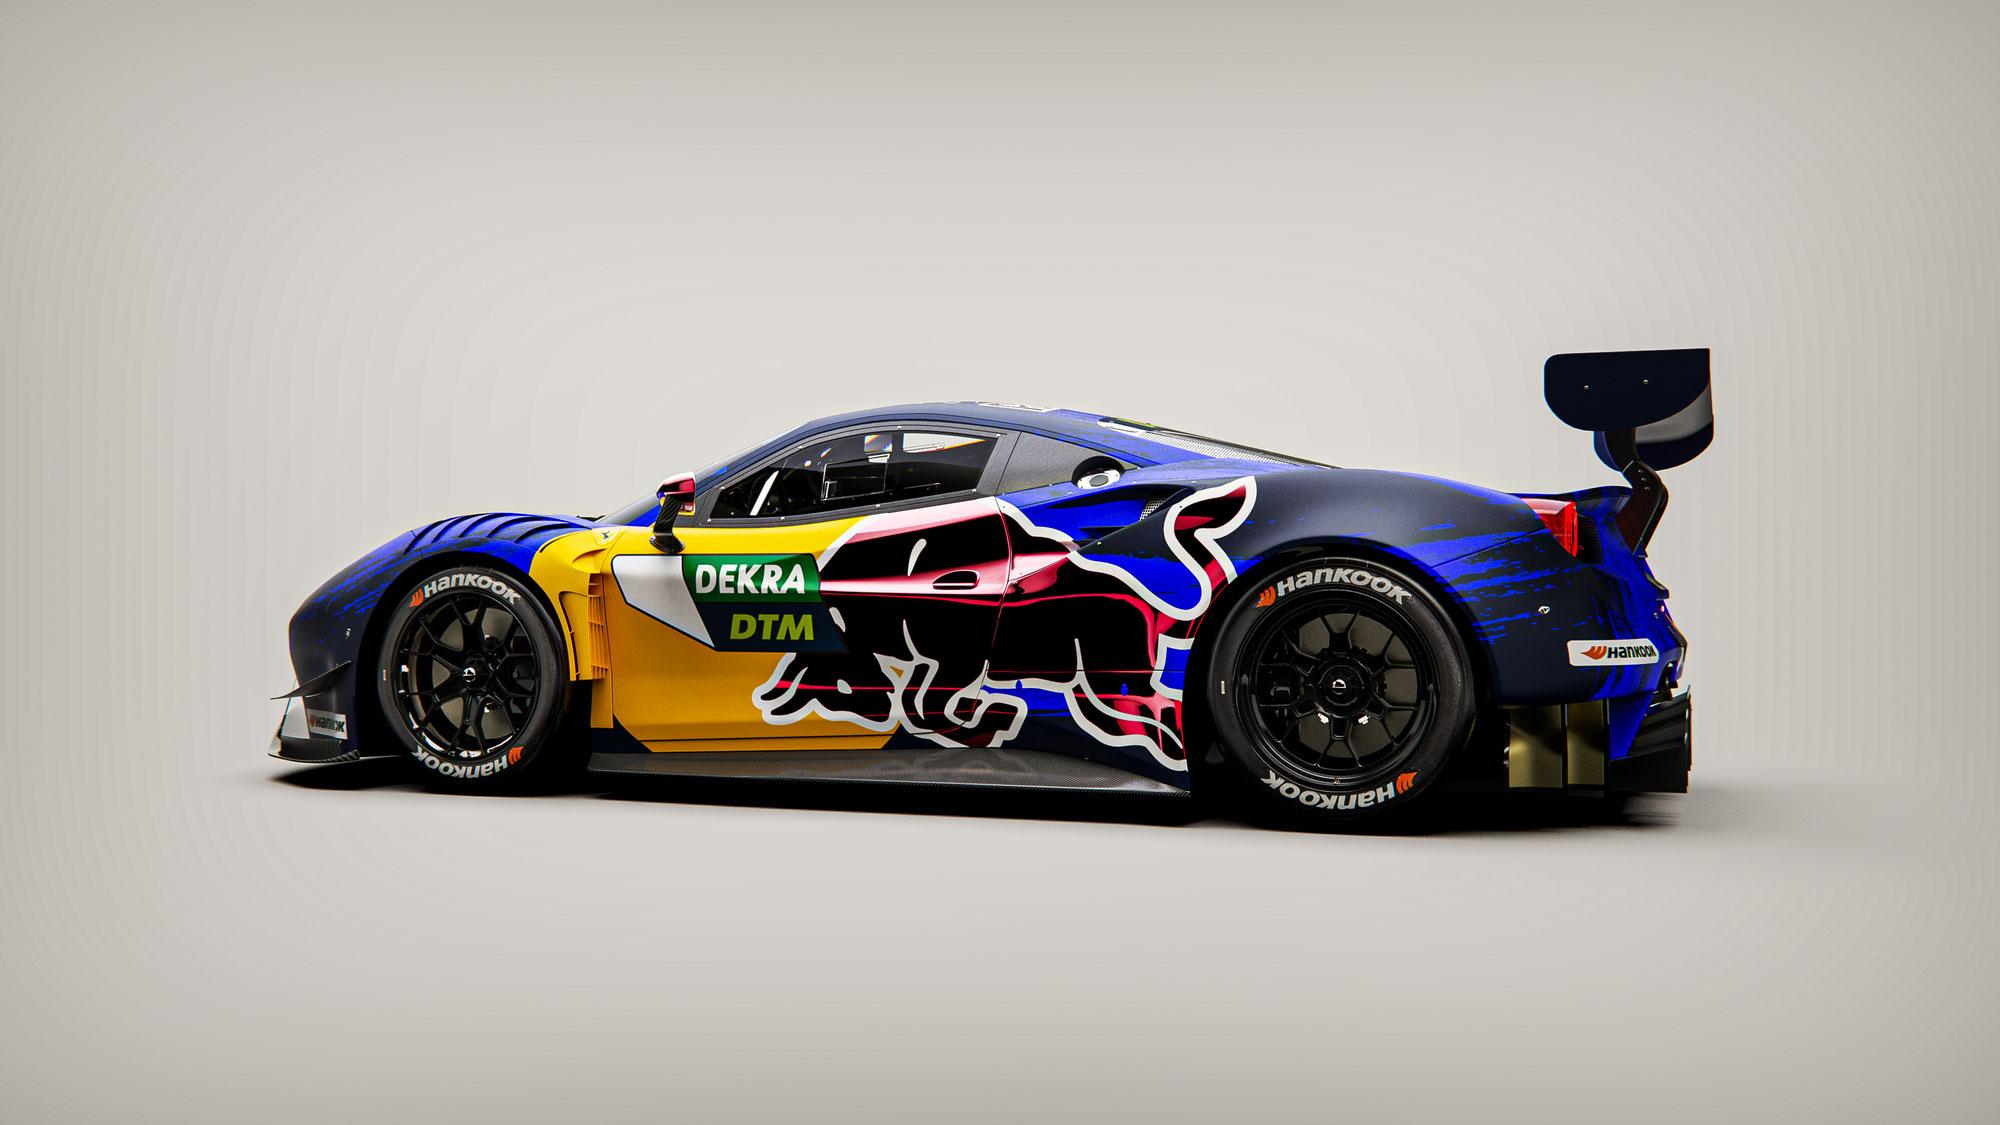 Red Bull feiert DTM-Comeback mit AF Corse